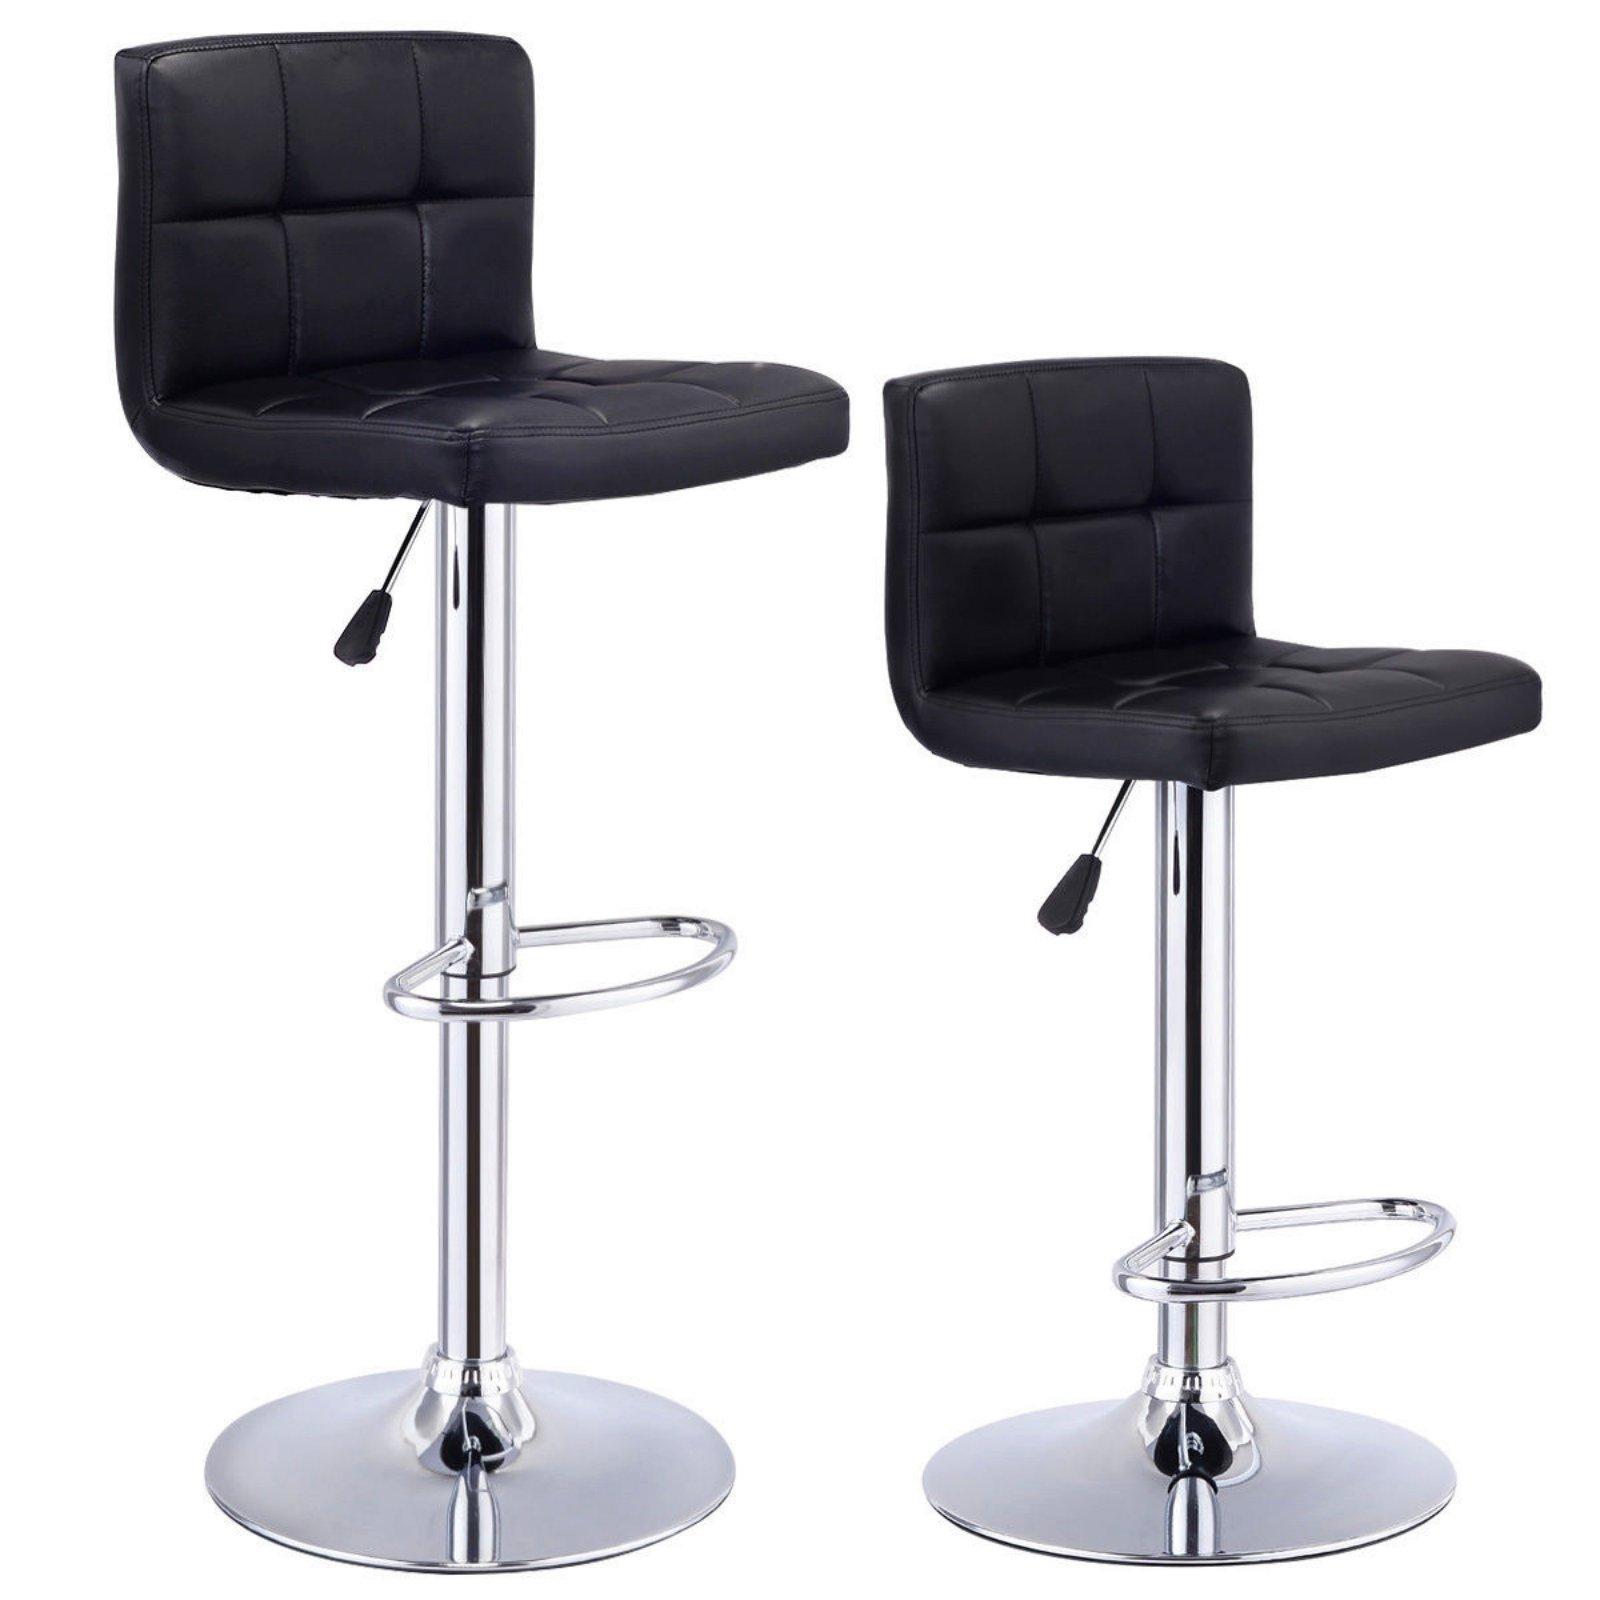 Set Of 2 Bar Stools Anti-aging PU Leather Adjustable Barstool 360 Degree Swivel Pub Style Comfortable Backrest/Black #719